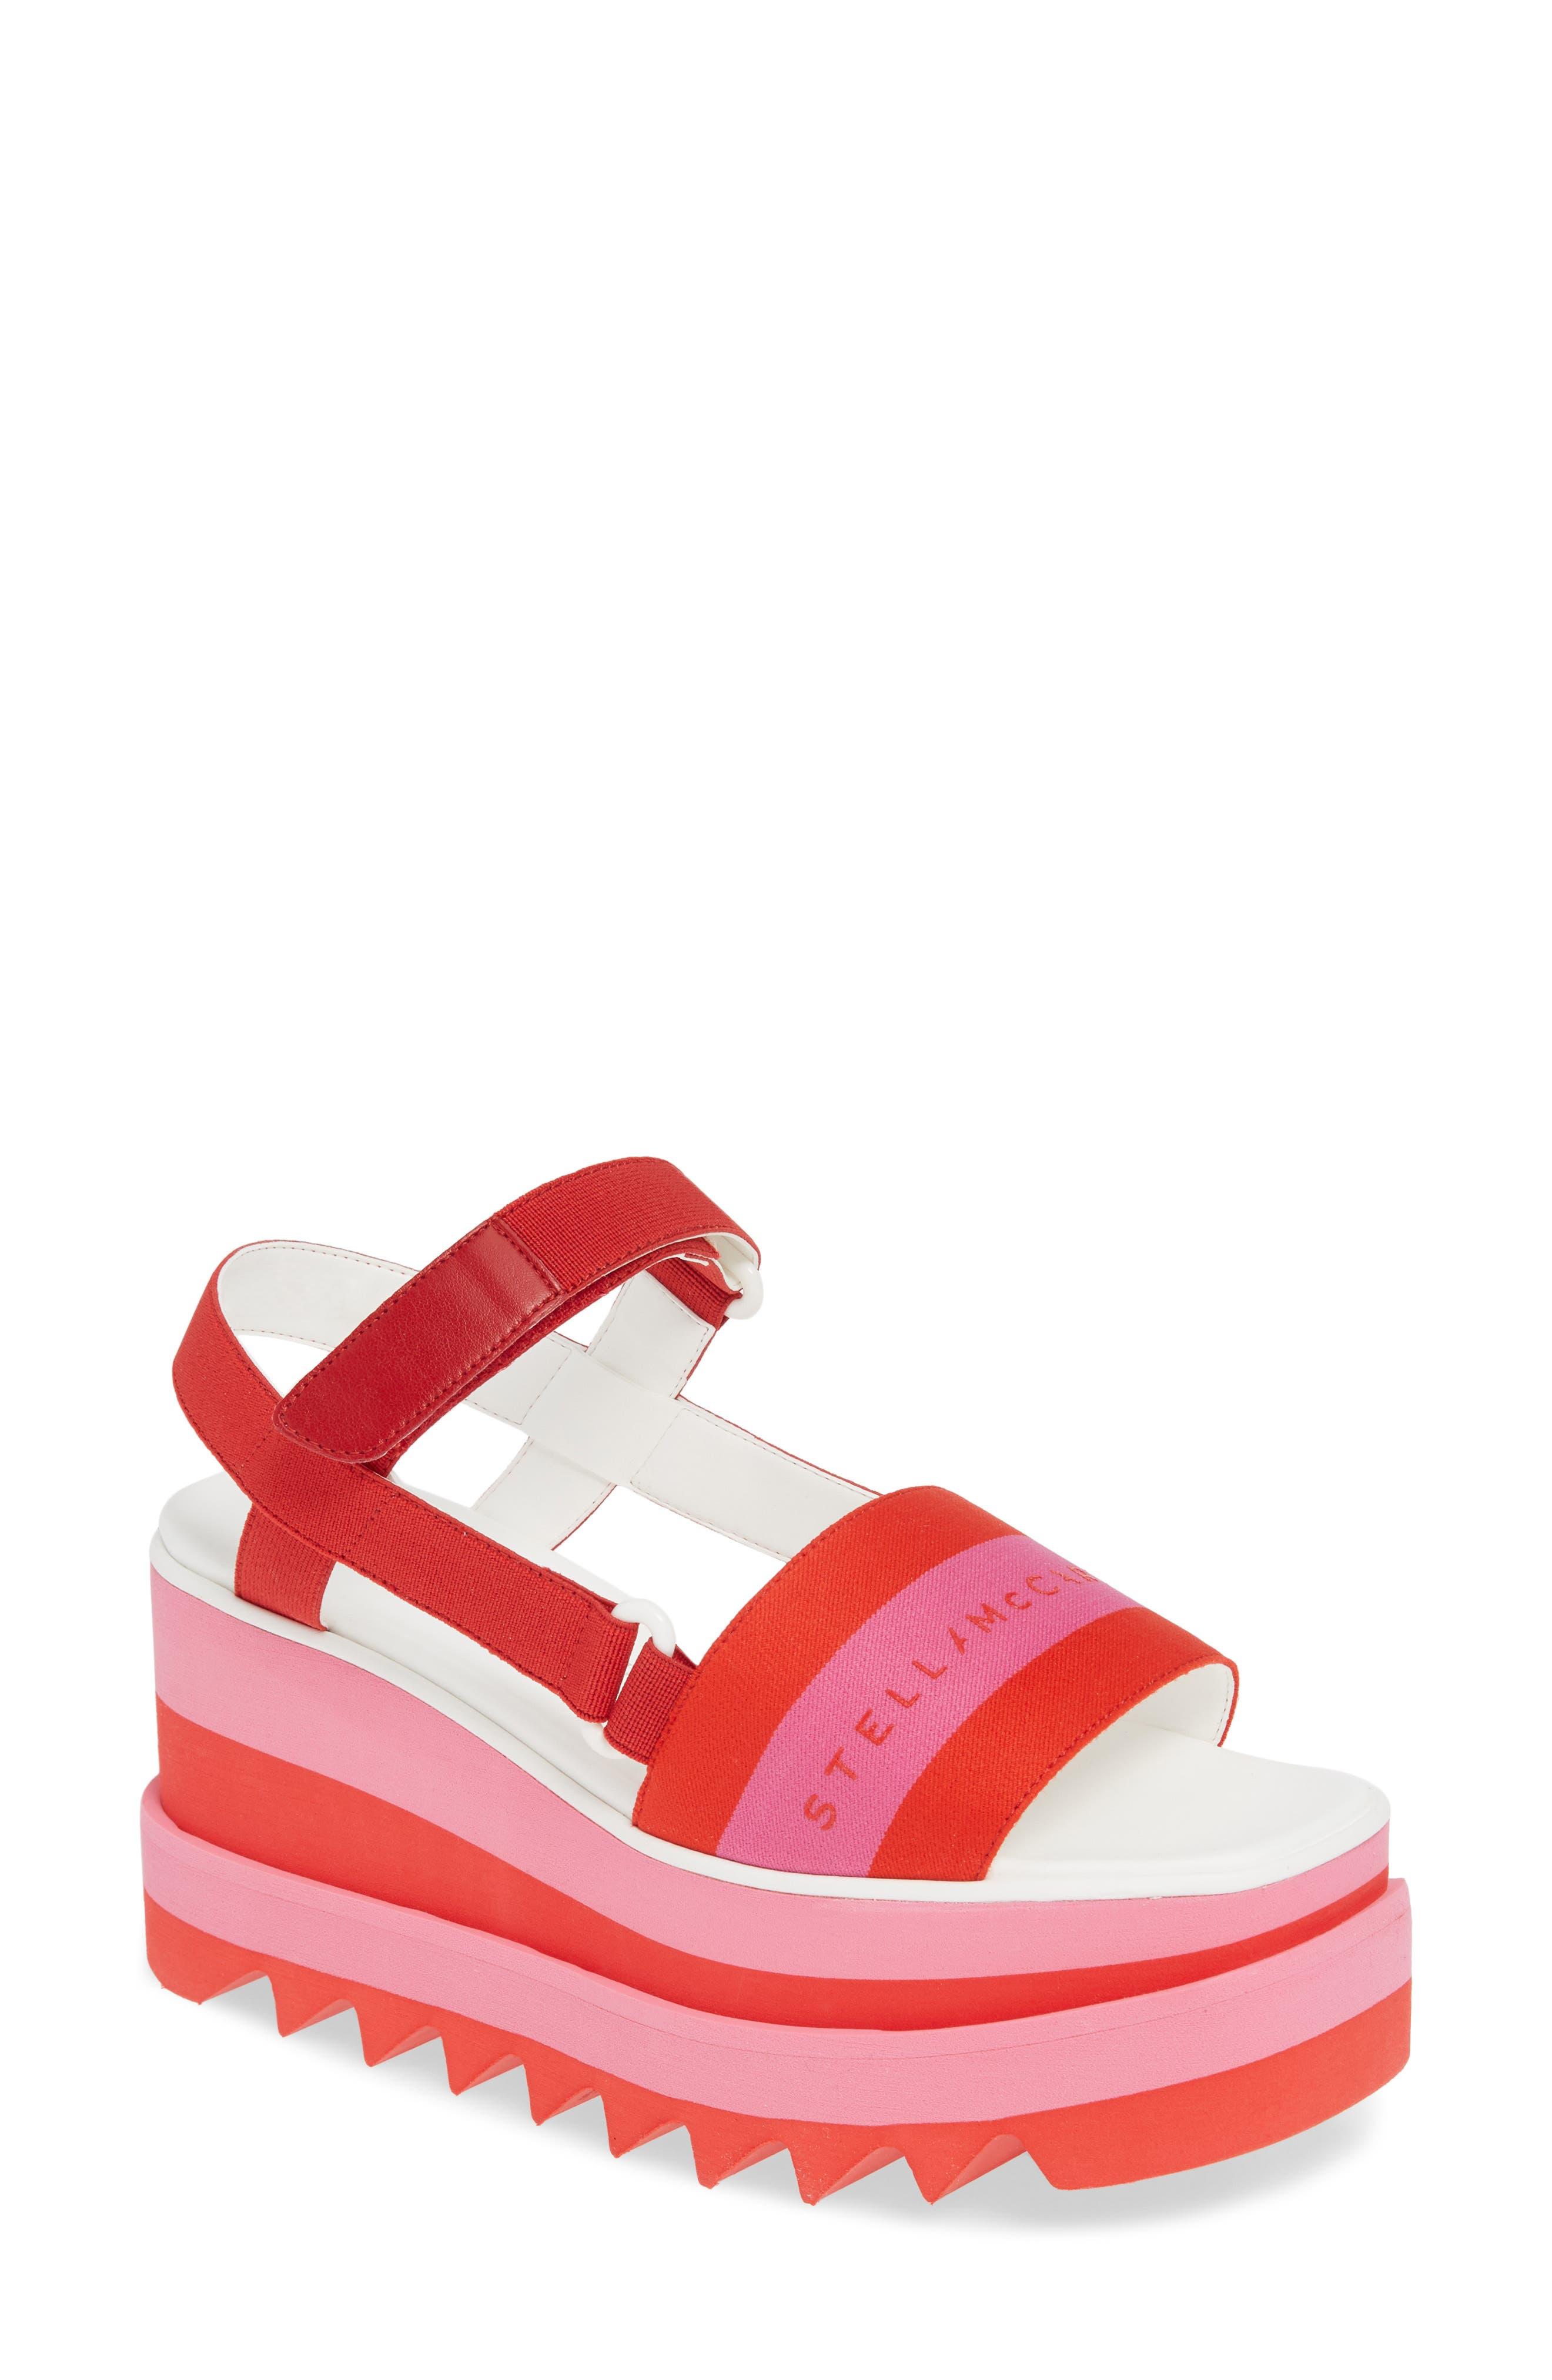 e3422ca0e44 Women s Stella Mccartney Sandals